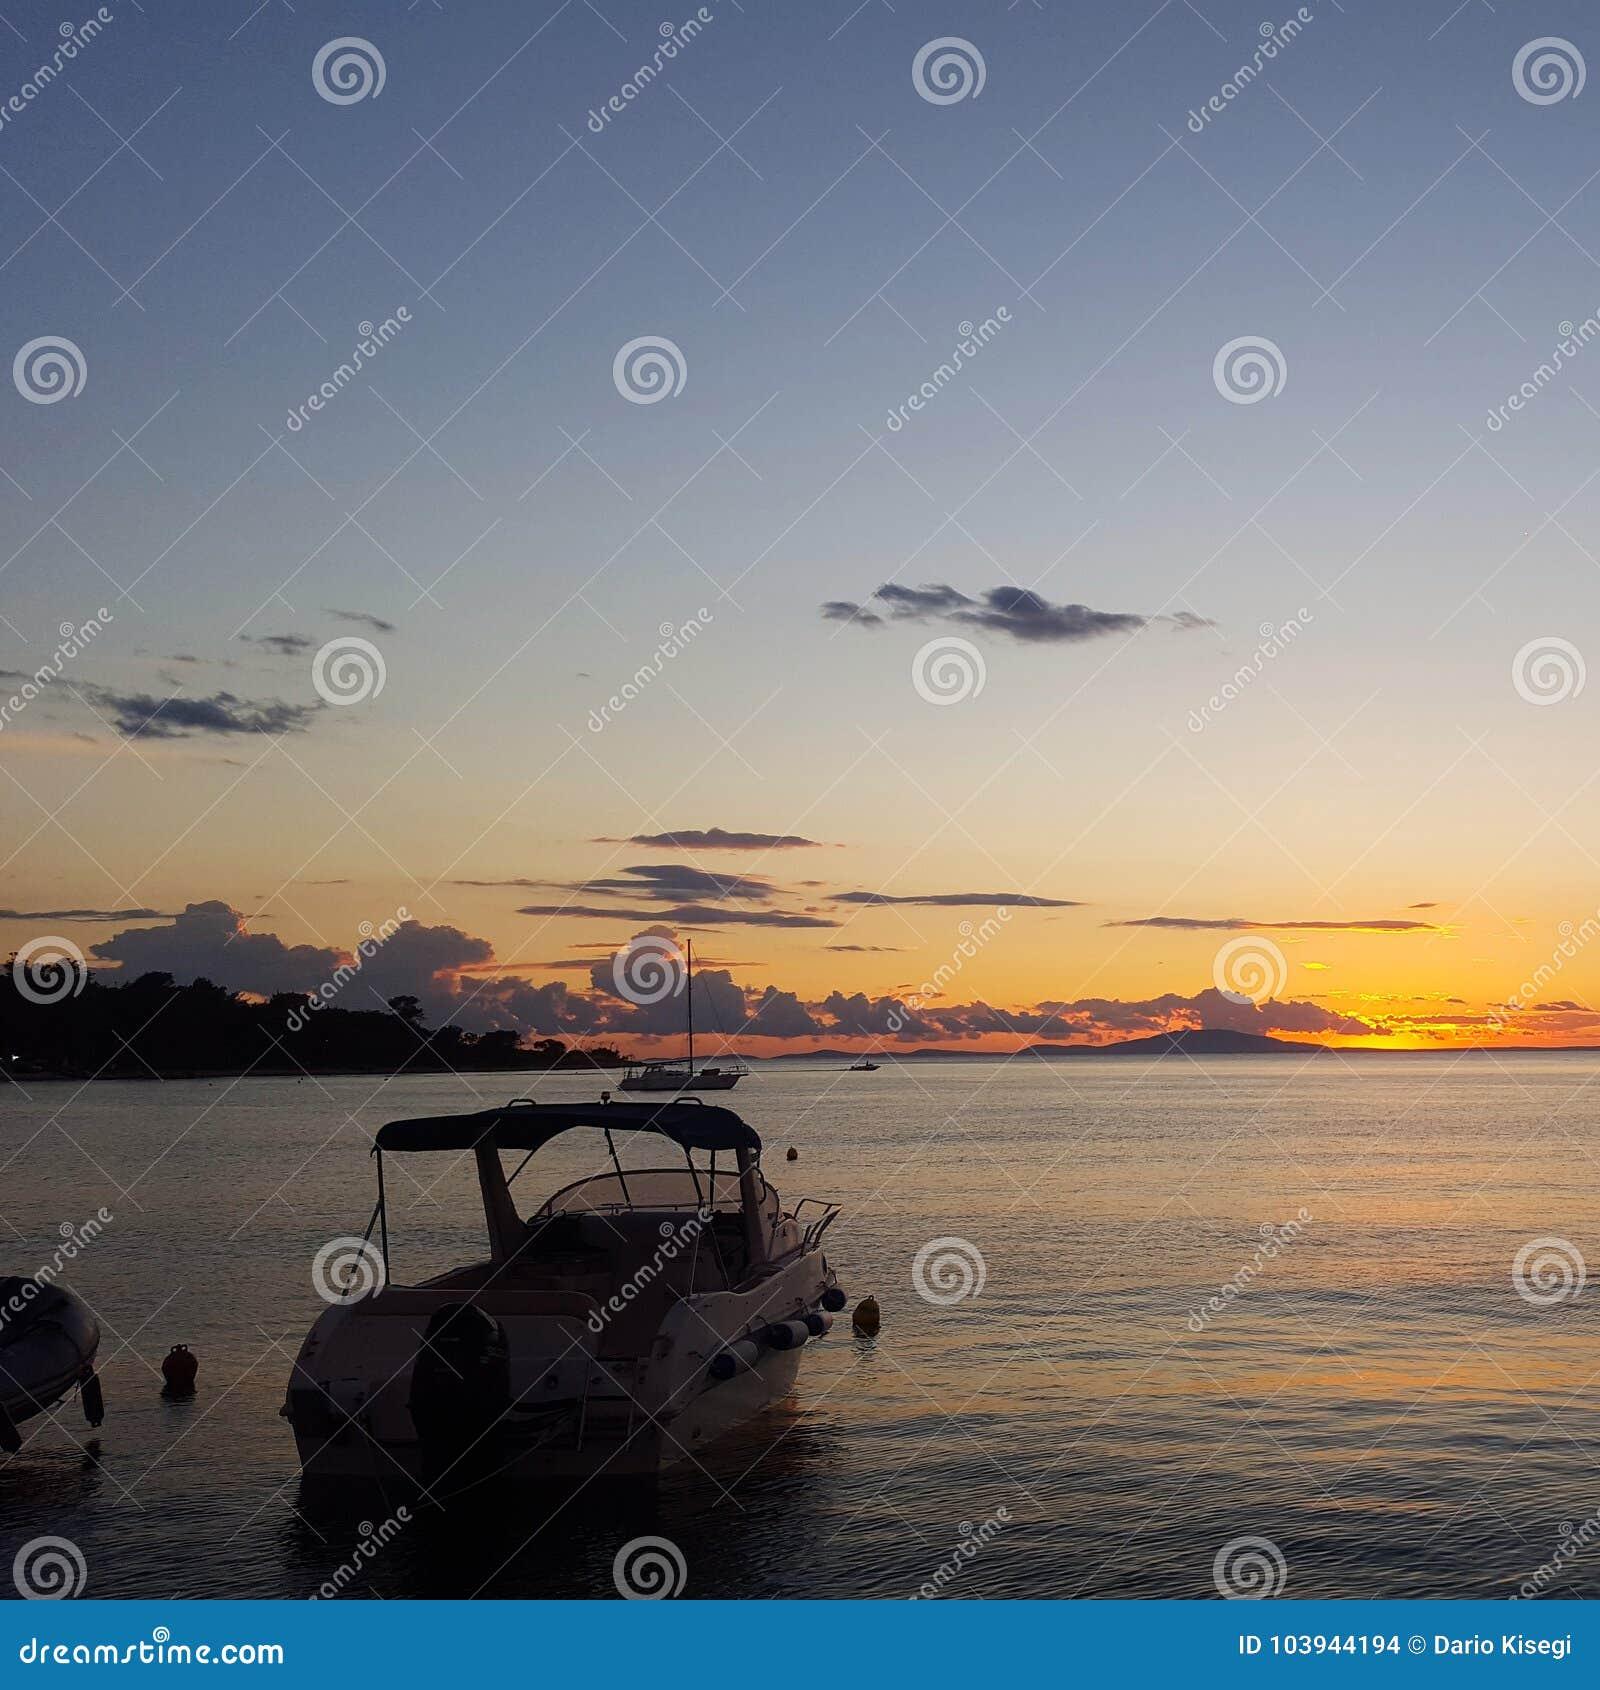 Lonley boat on the sea